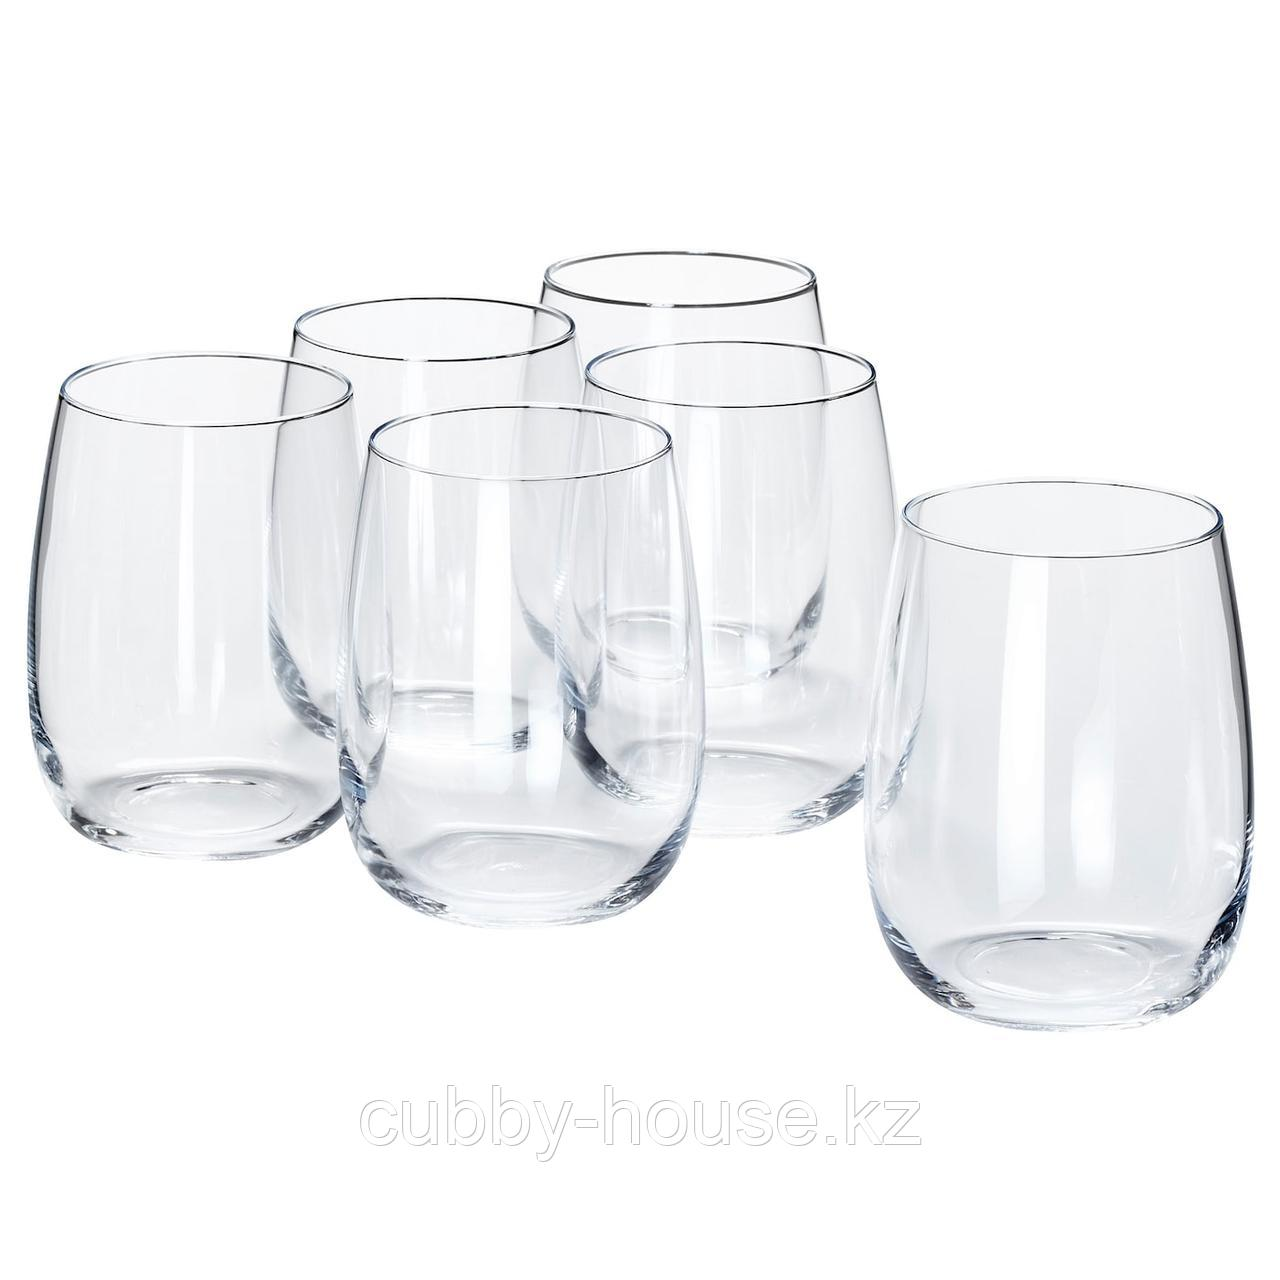 СТОРСИНТ Стакан, прозрачное стекло, 37 сл